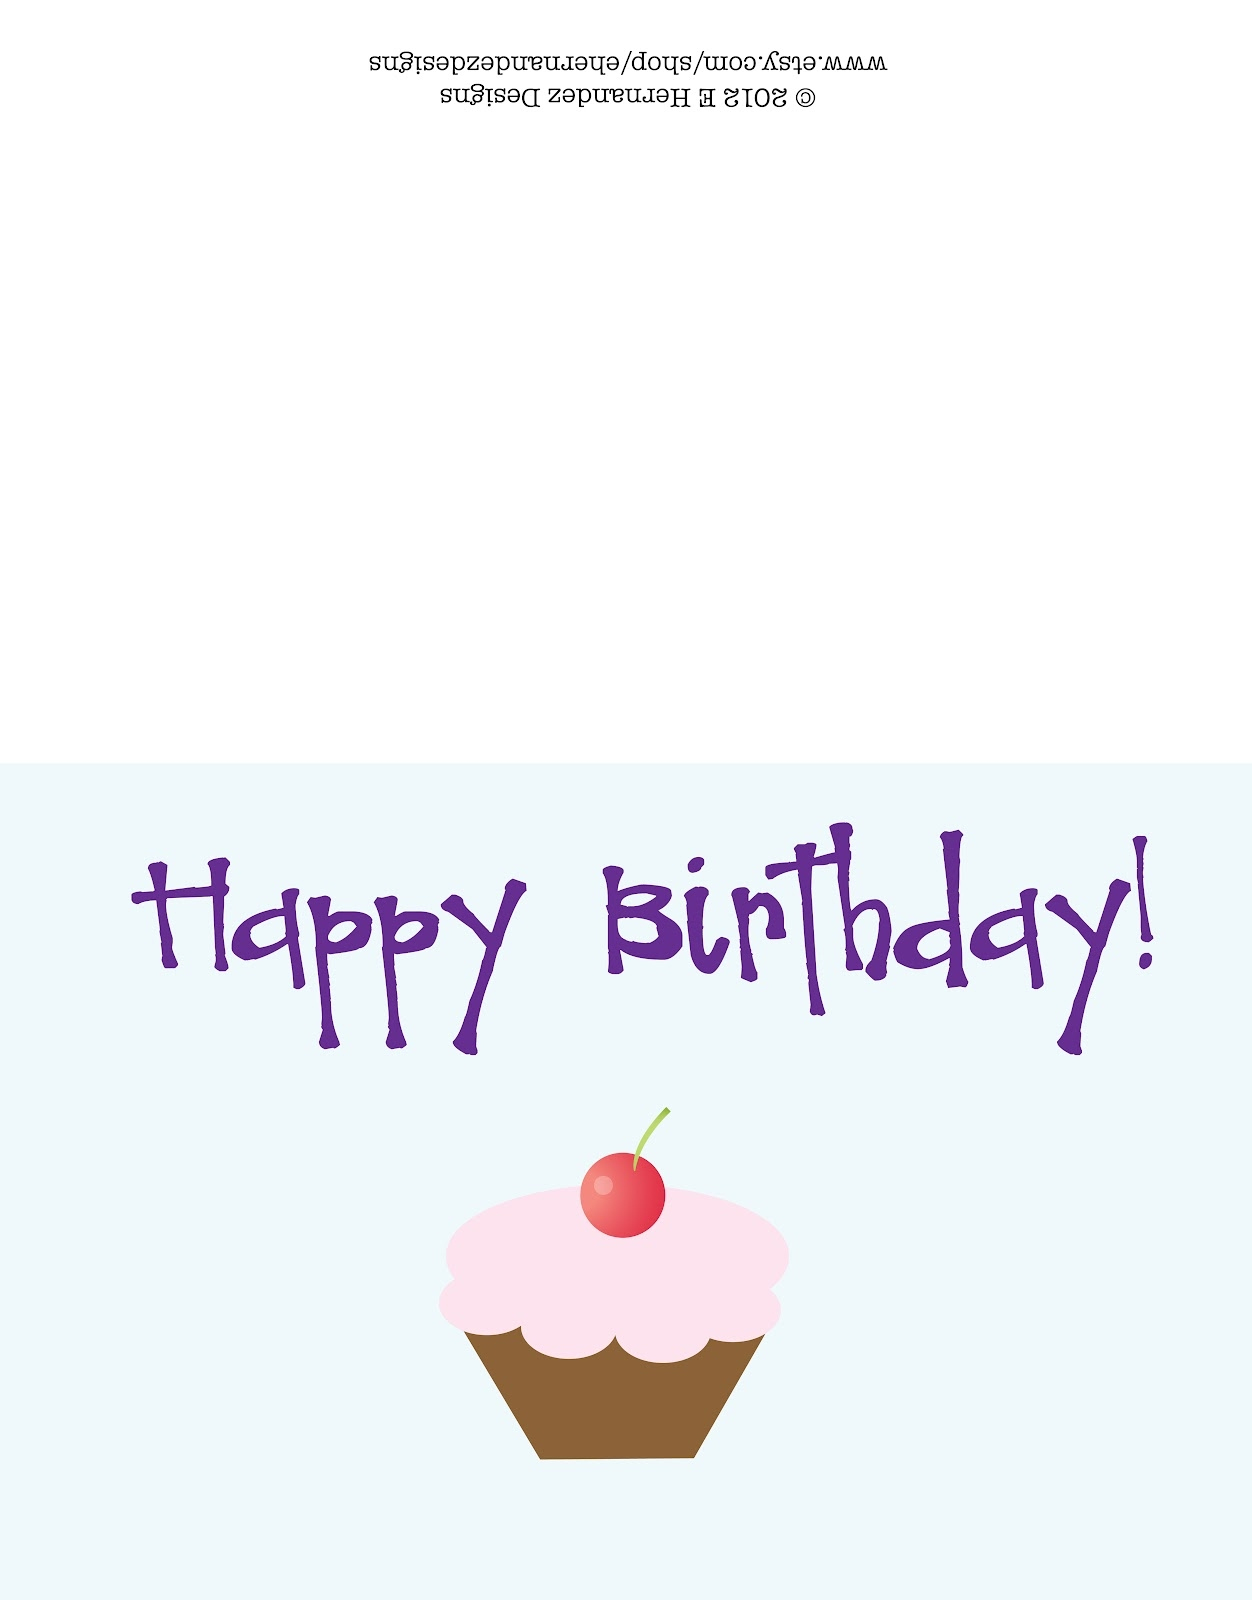 Printable Birthday Card Free   Lexu.tk - Free Online Funny Birthday Cards Printable